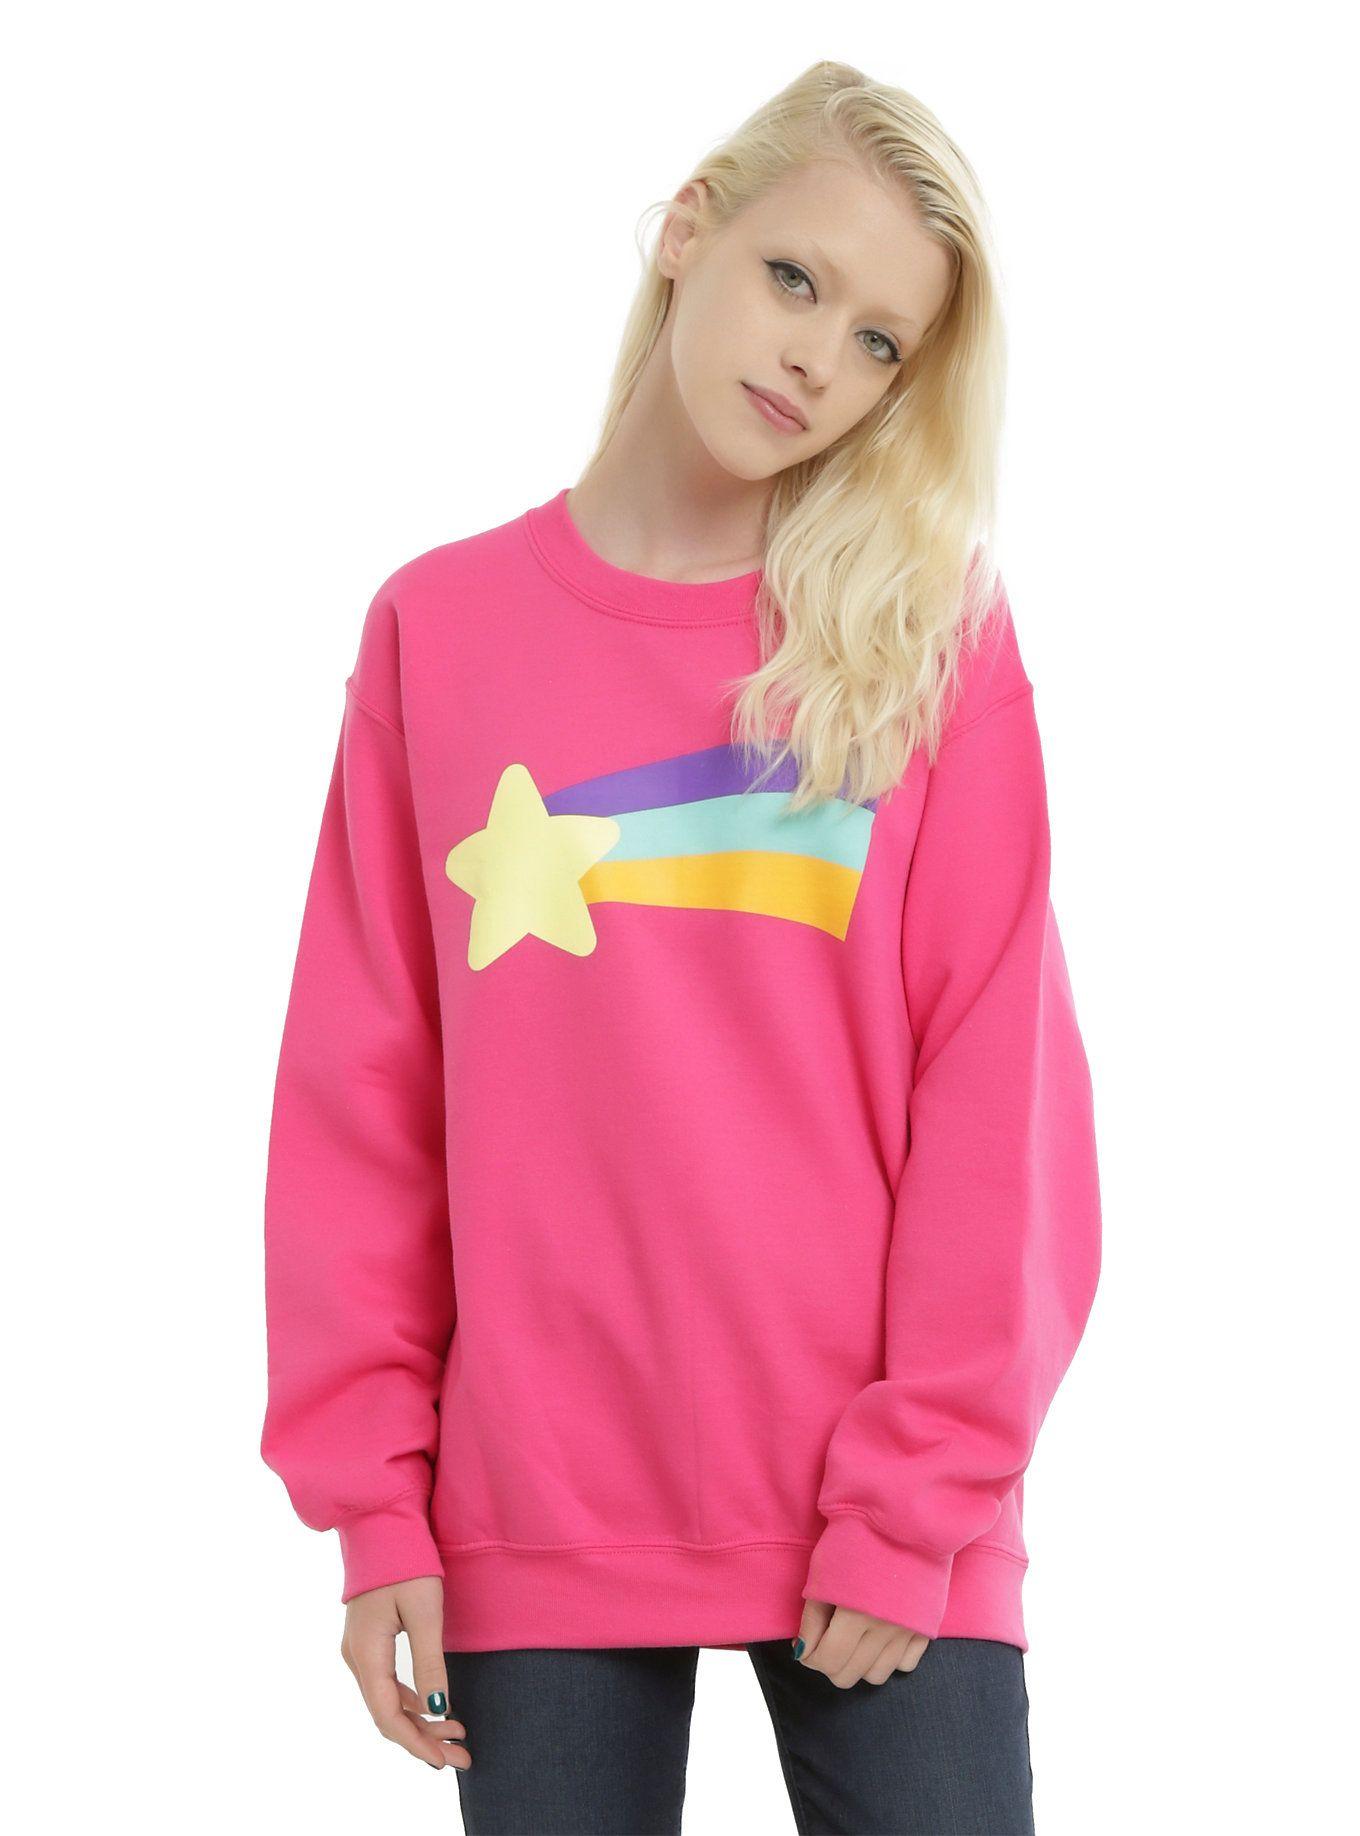 Gravity falls mabels rainbow star sweater sweatshirt